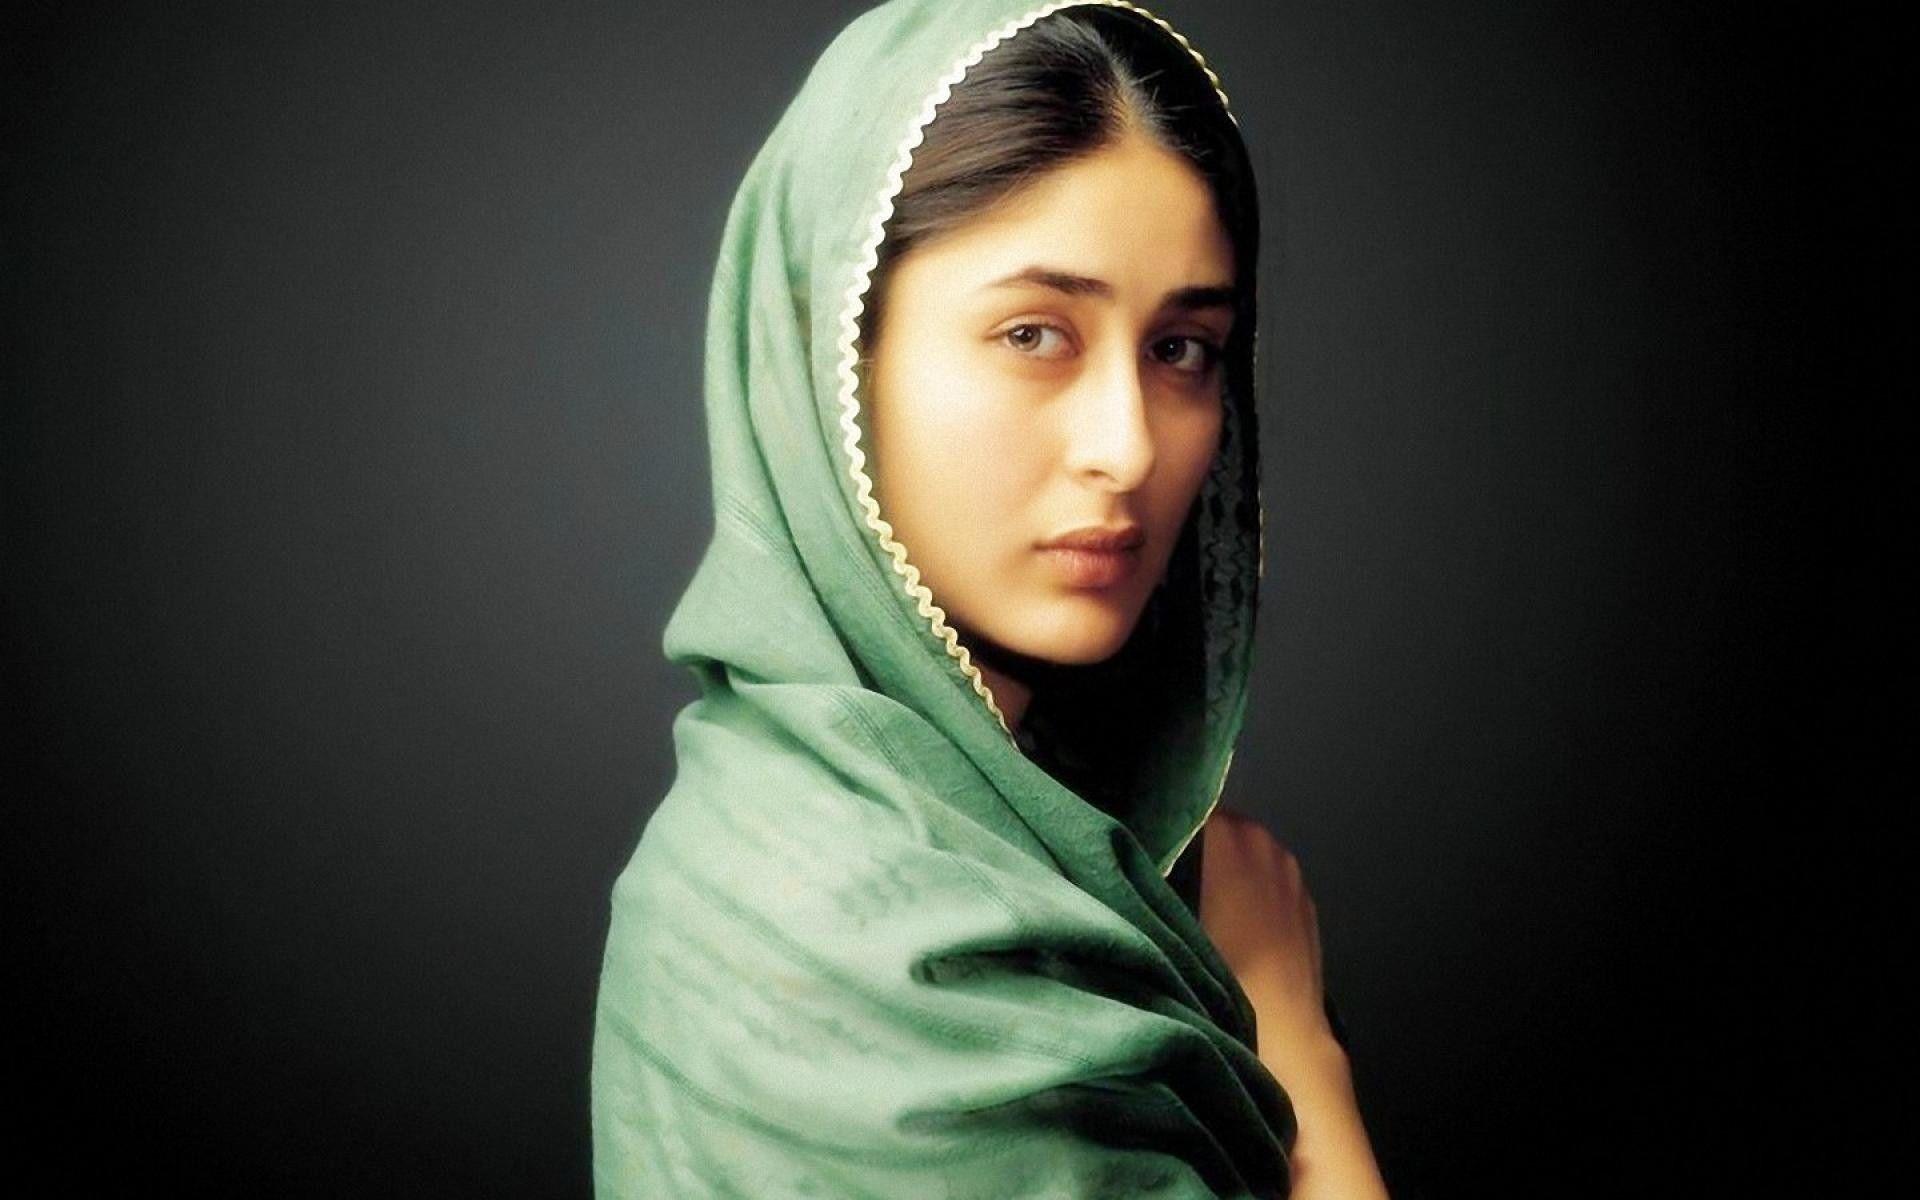 Kareena Kapoor Heroine Wallpapers Free Download